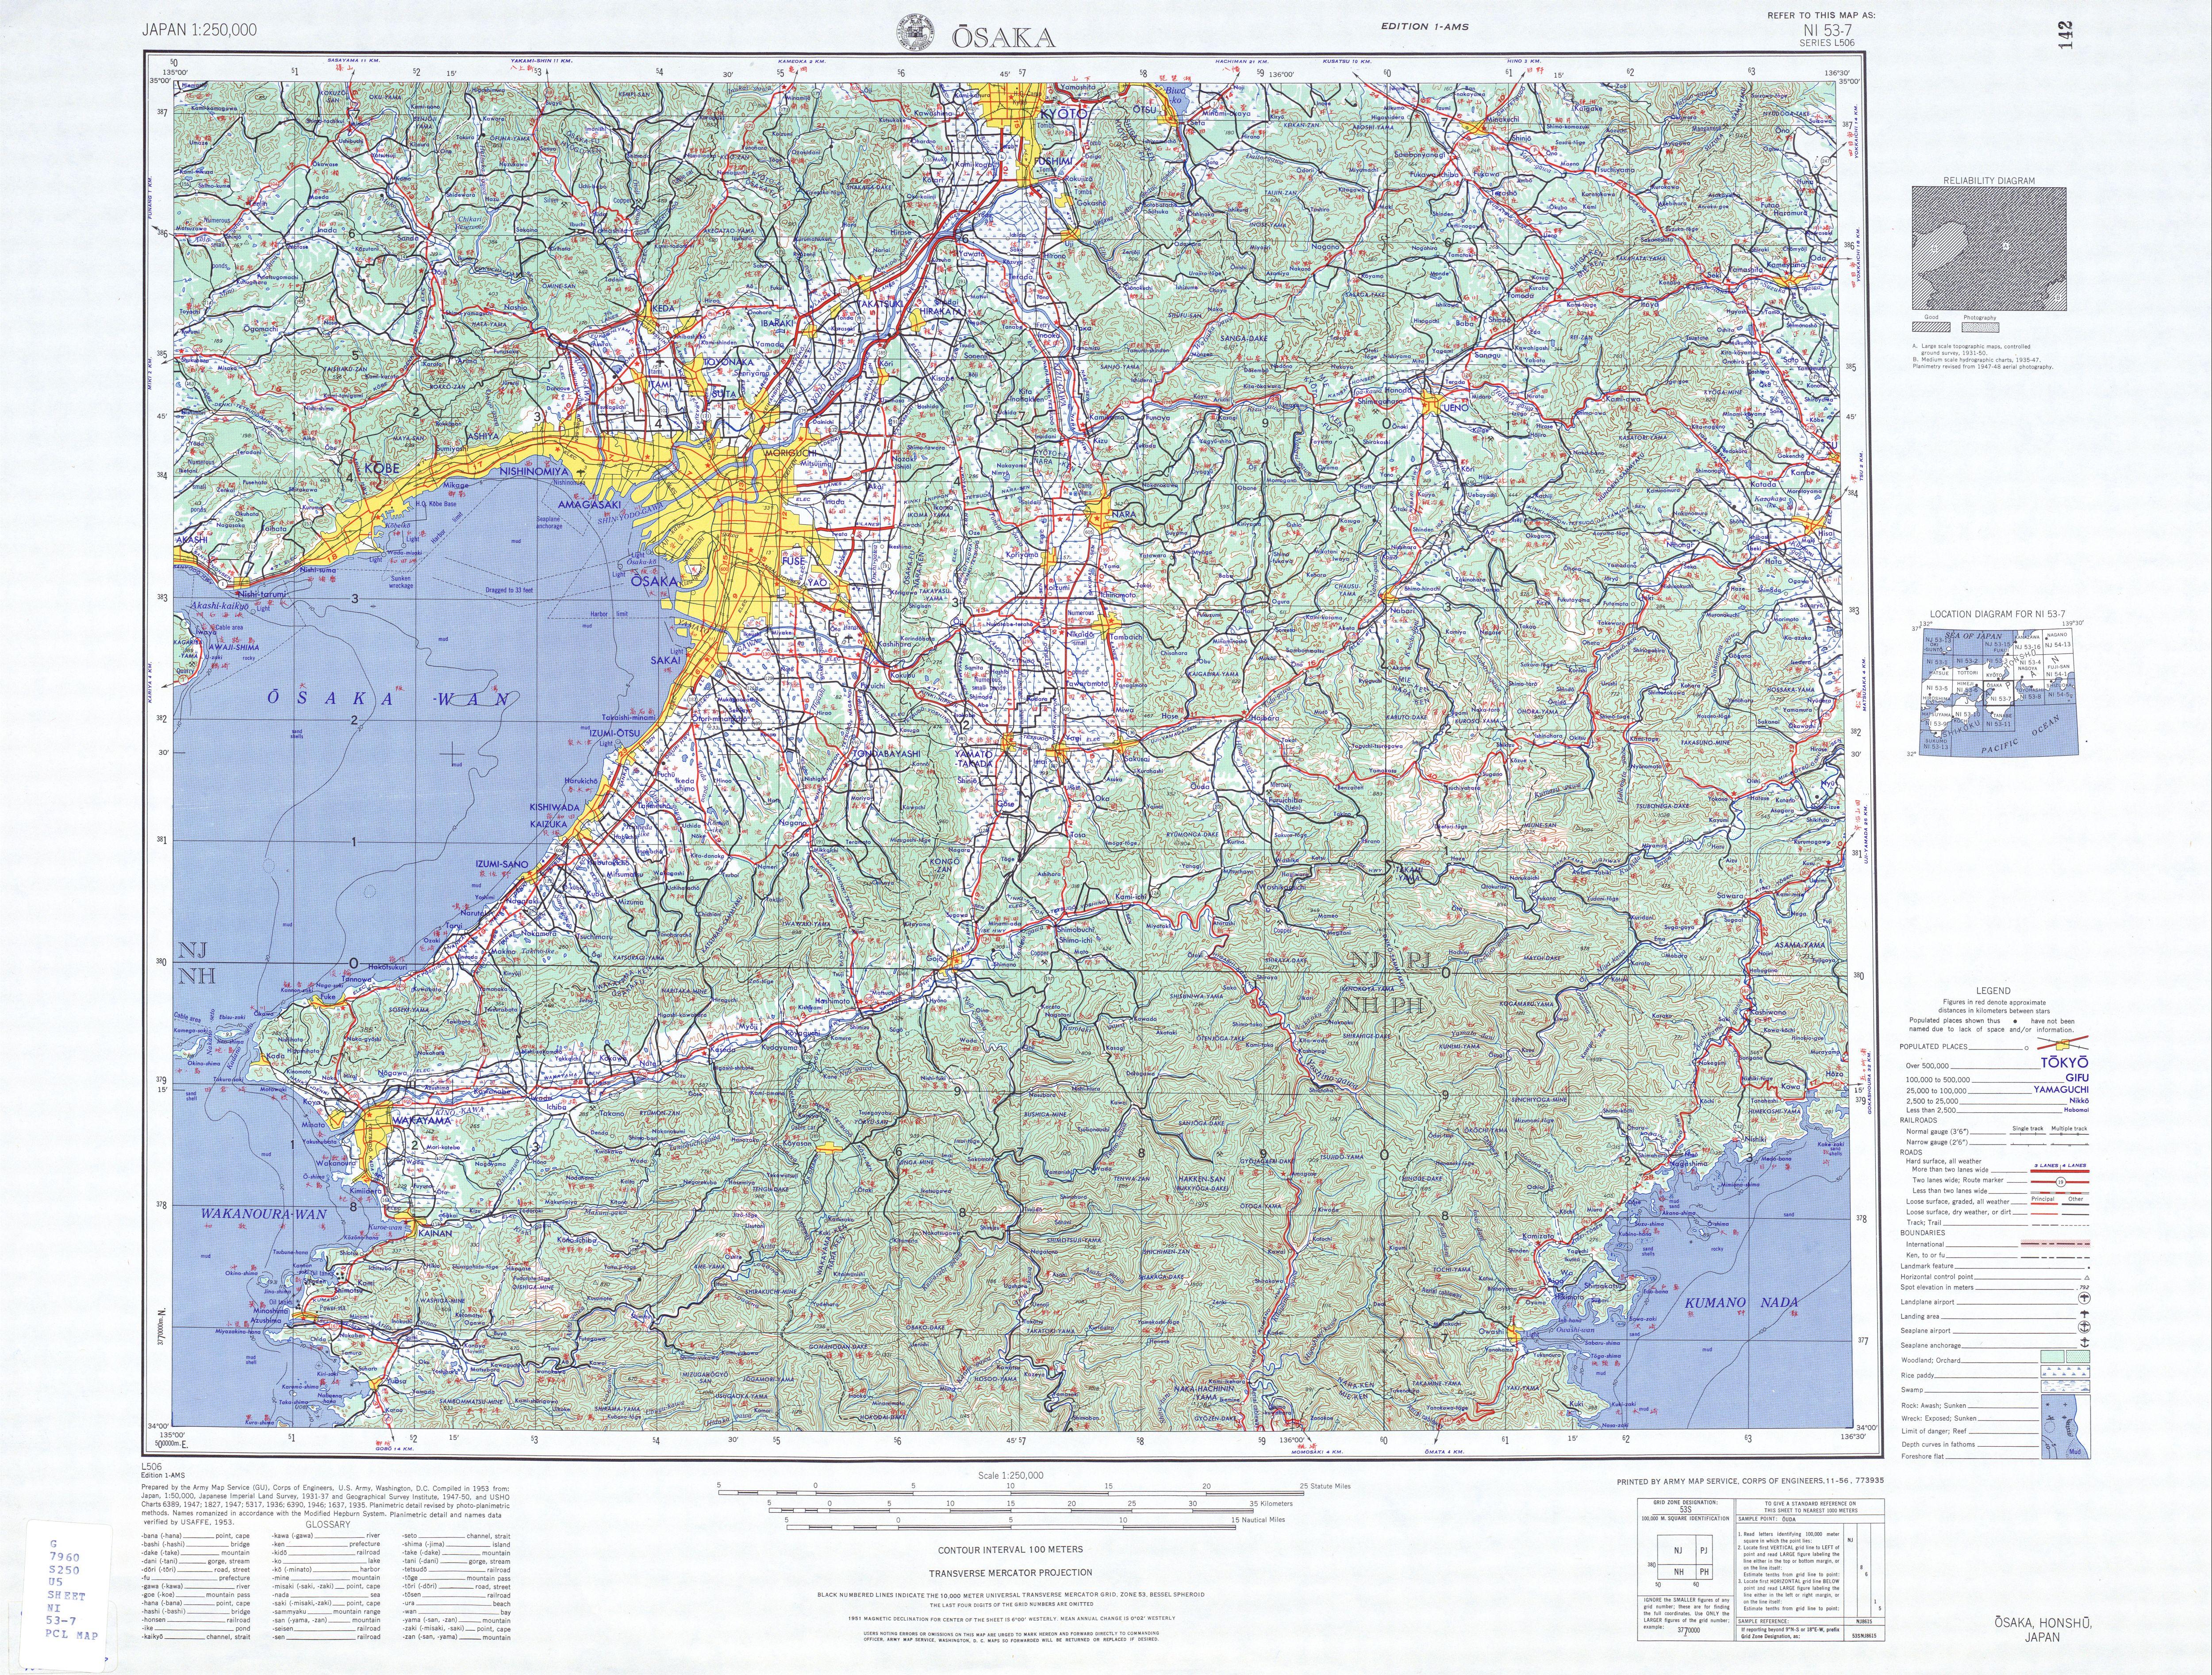 Osaka Topographic Map Sheet, Japan 1954